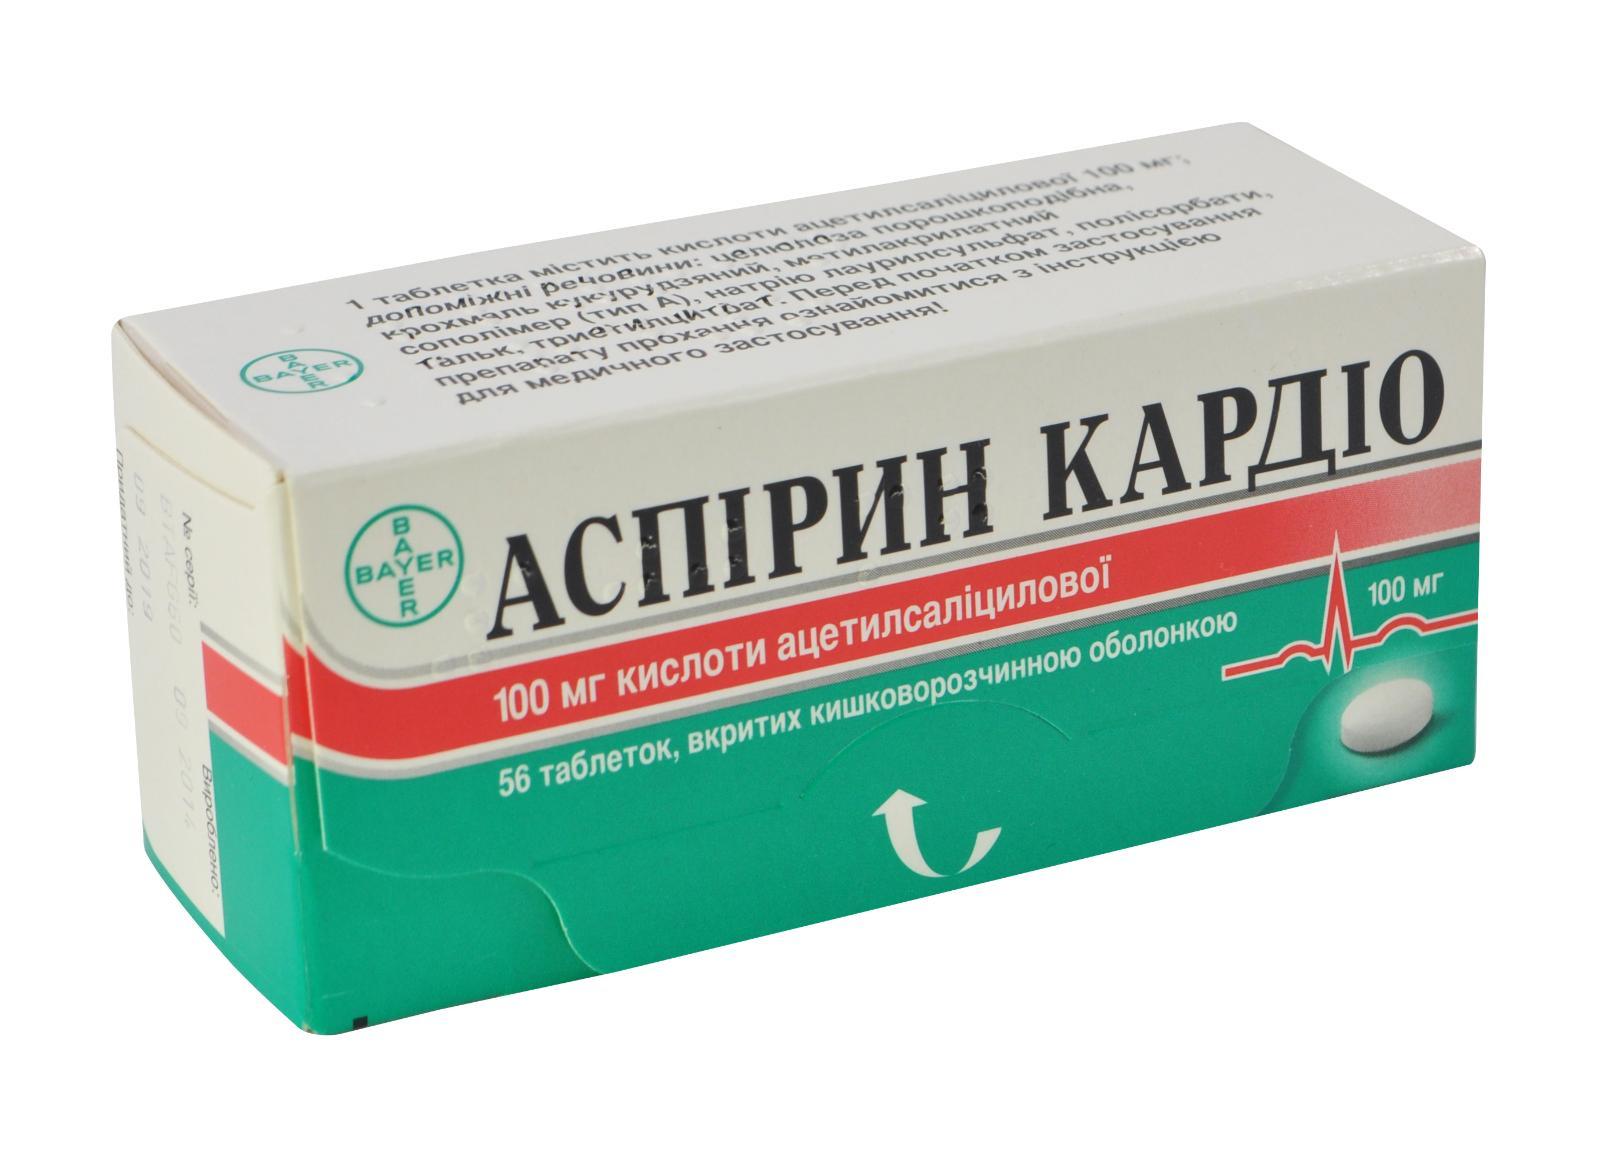 958 АКАРД - Acetylsalicylic acid